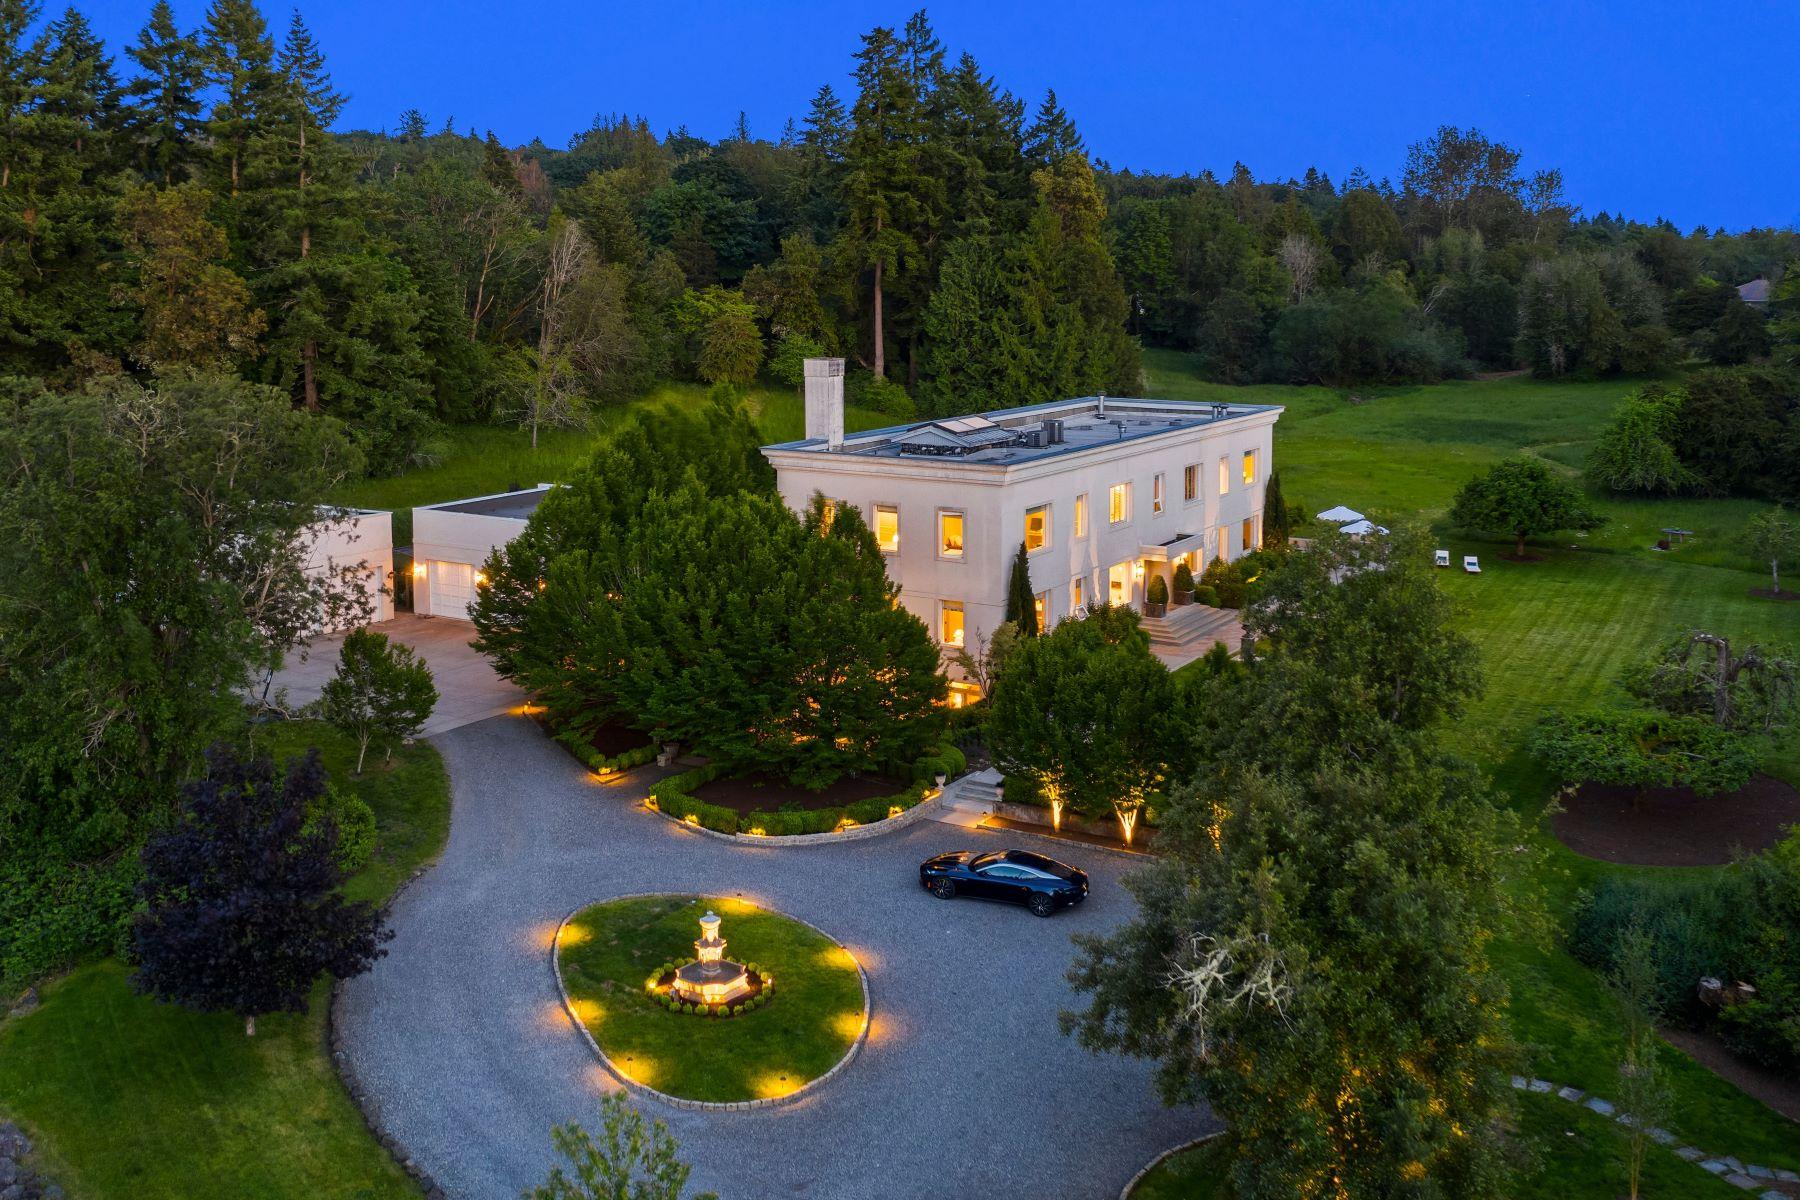 Single Family Homes for Sale at Building 39: A Timeless Island Estate 10000 NE Kitsap St Bainbridge Island, Washington 98110 United States